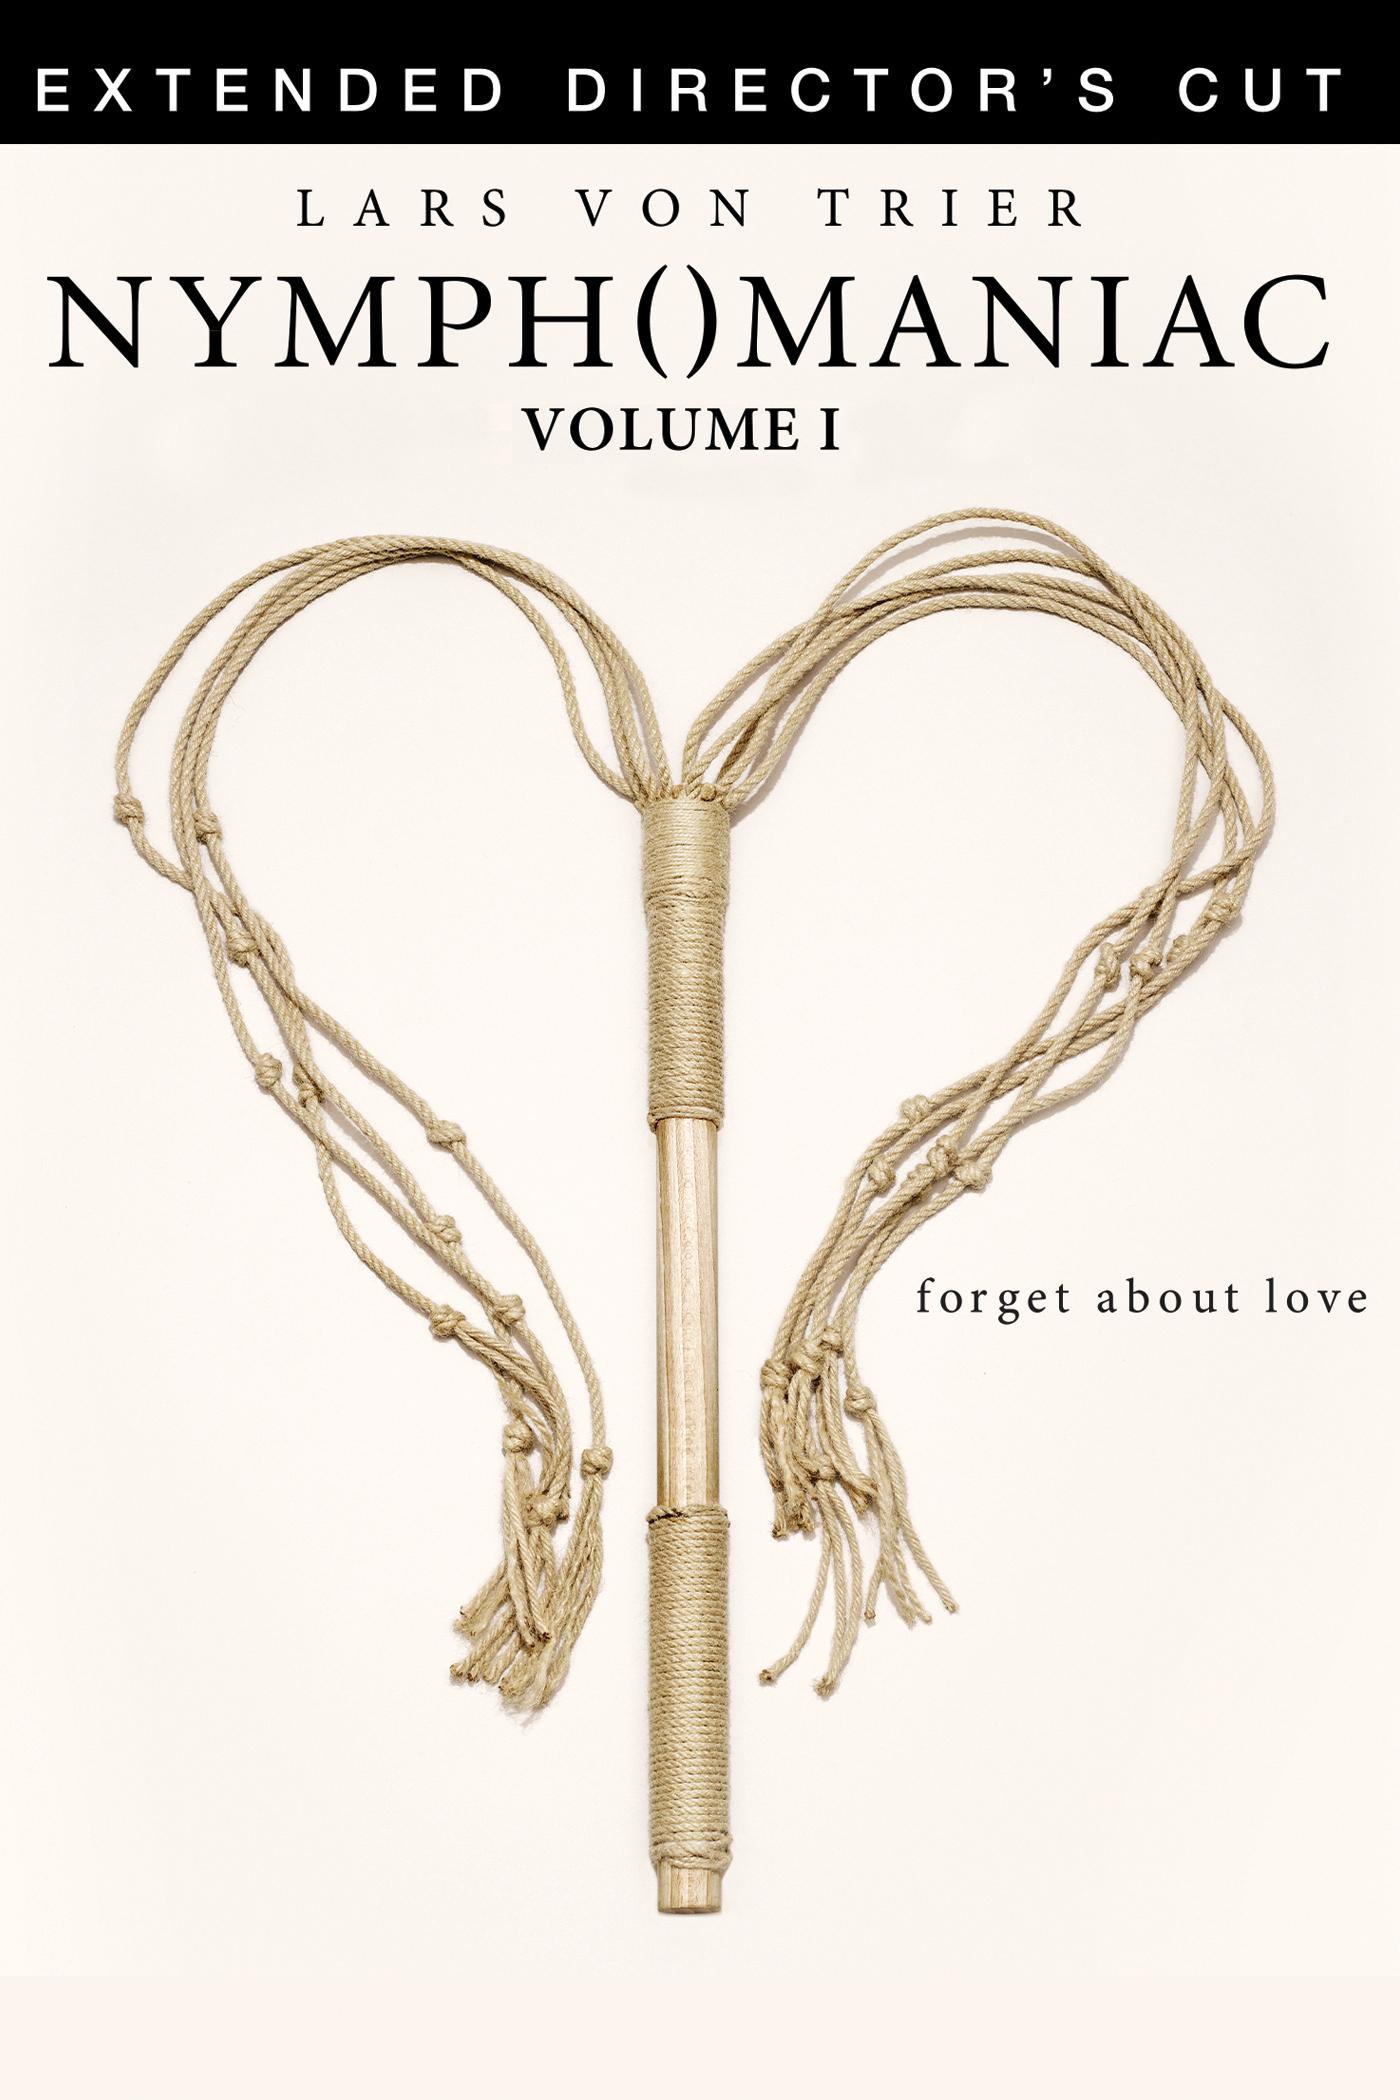 Nymphomaniac: Volume I (Extended Director's Cut)